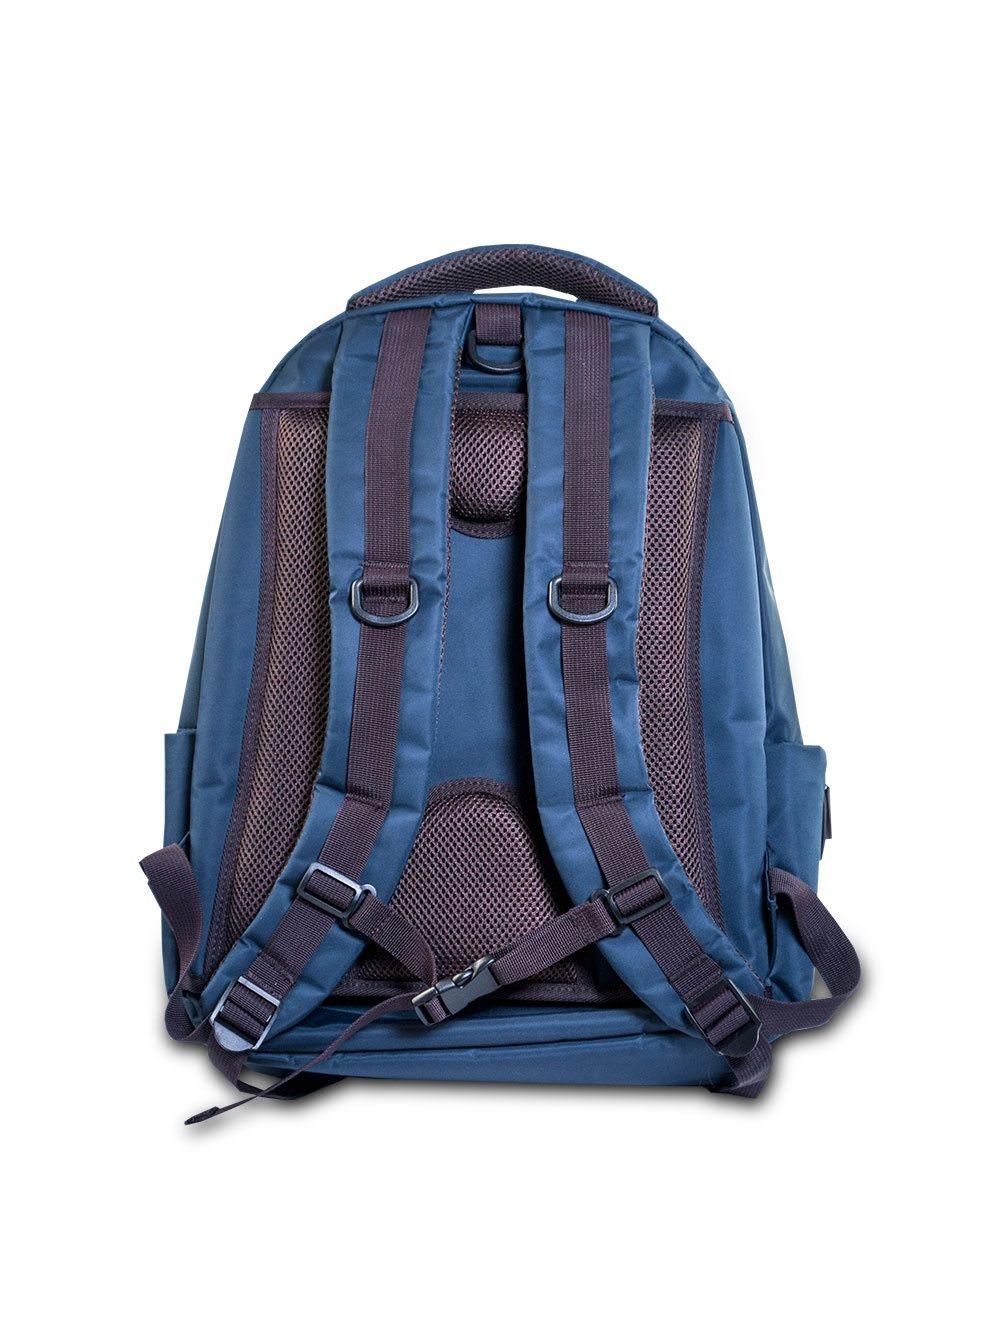 Backpack Nylon/Leather